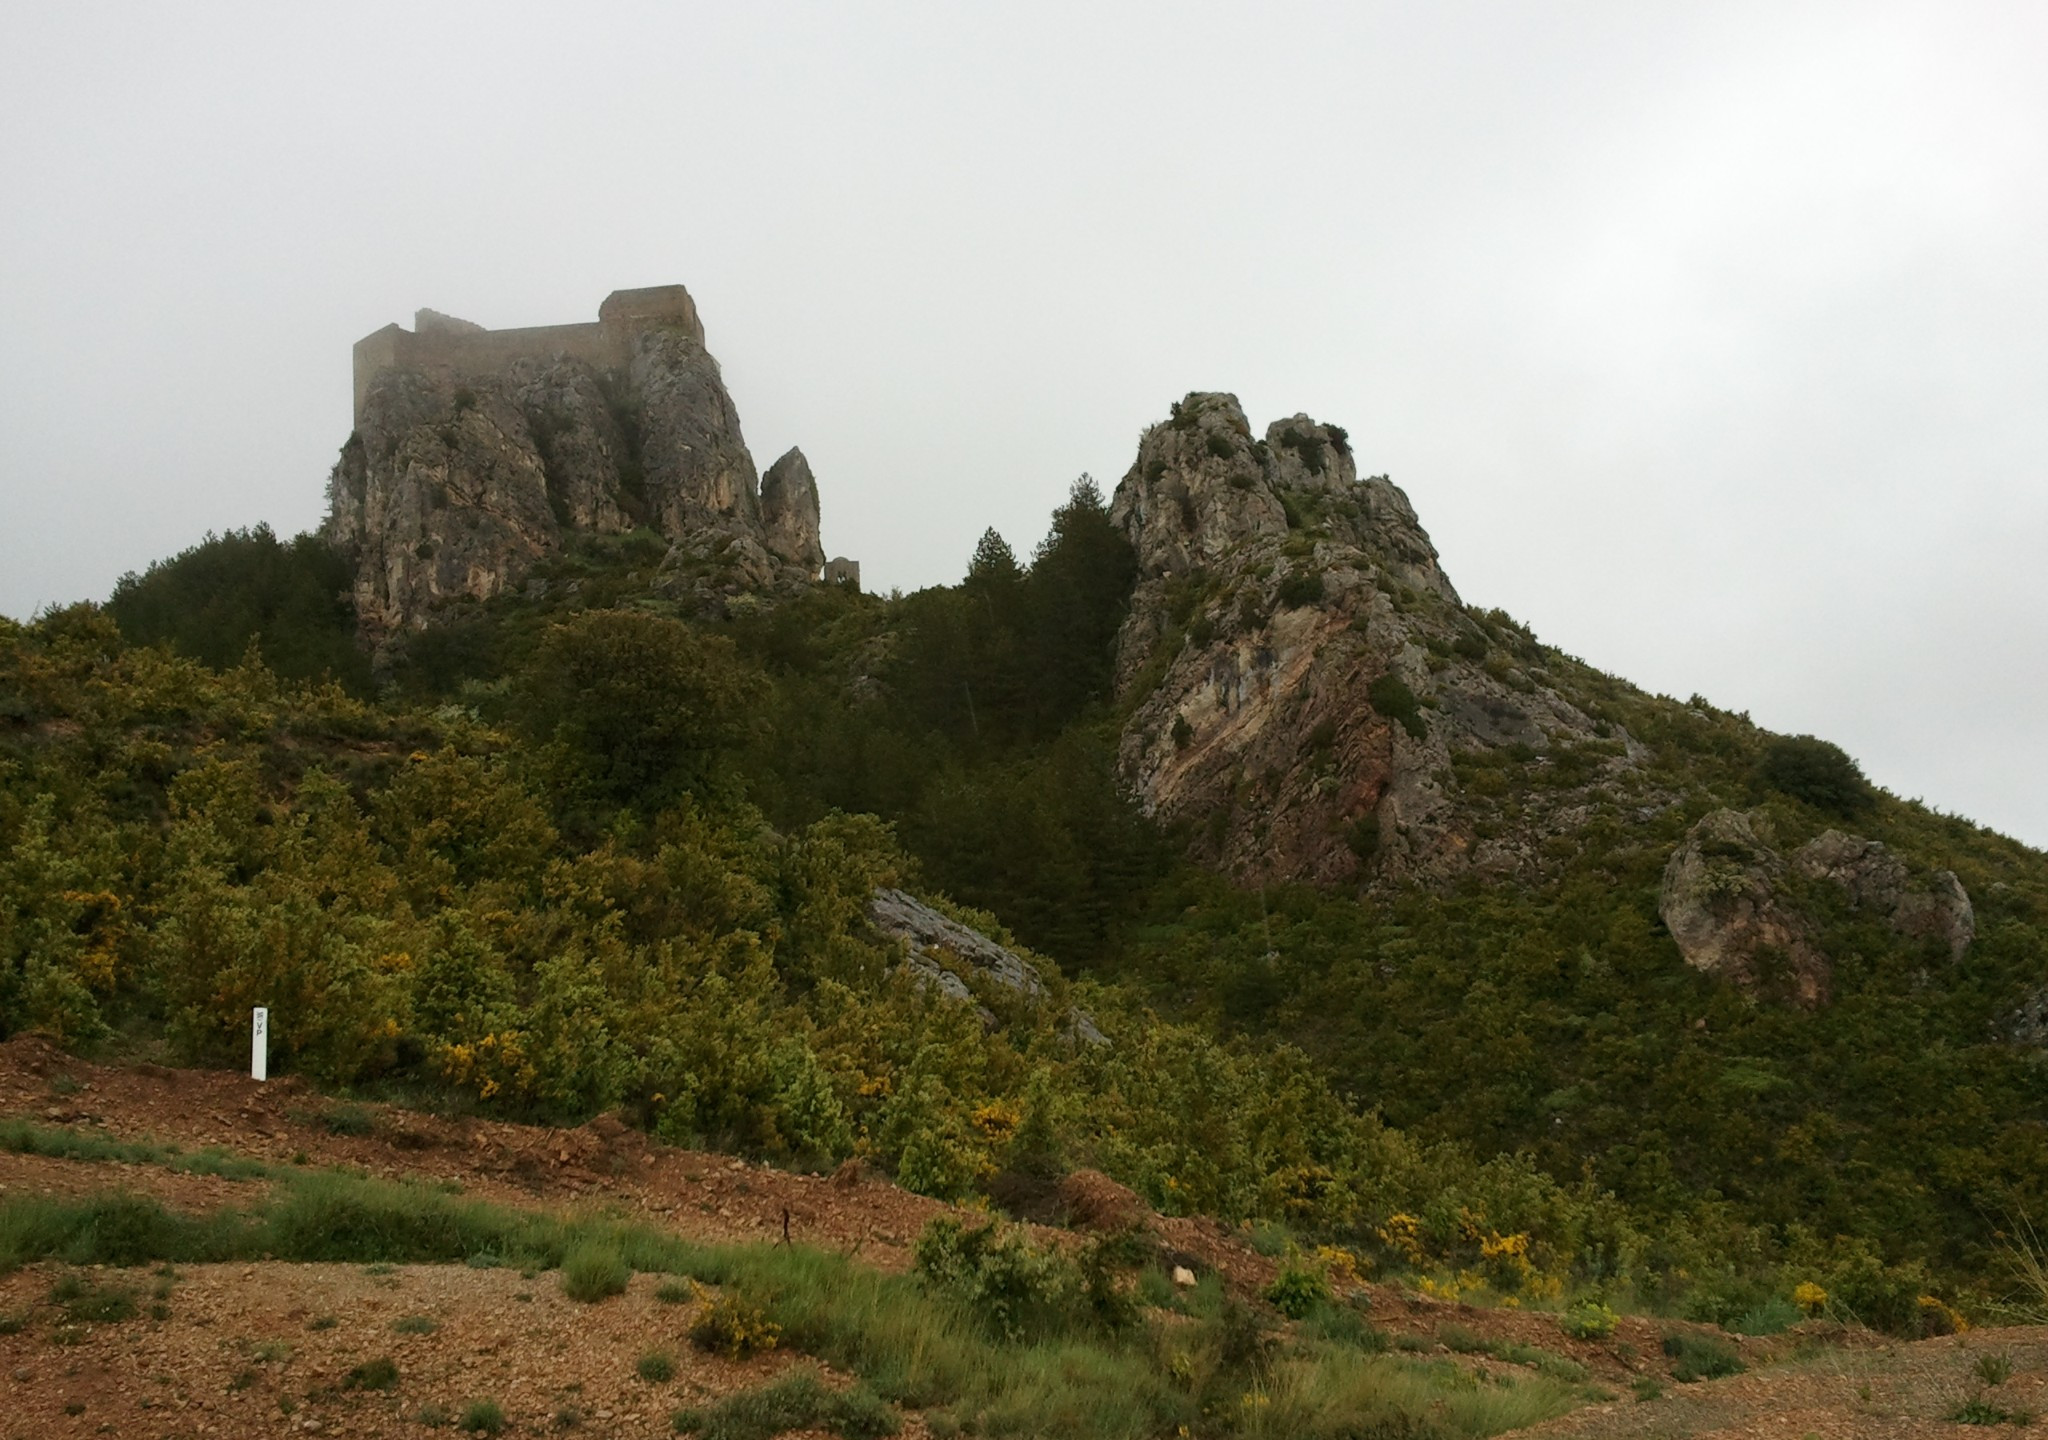 Castillo de Loarre - 06